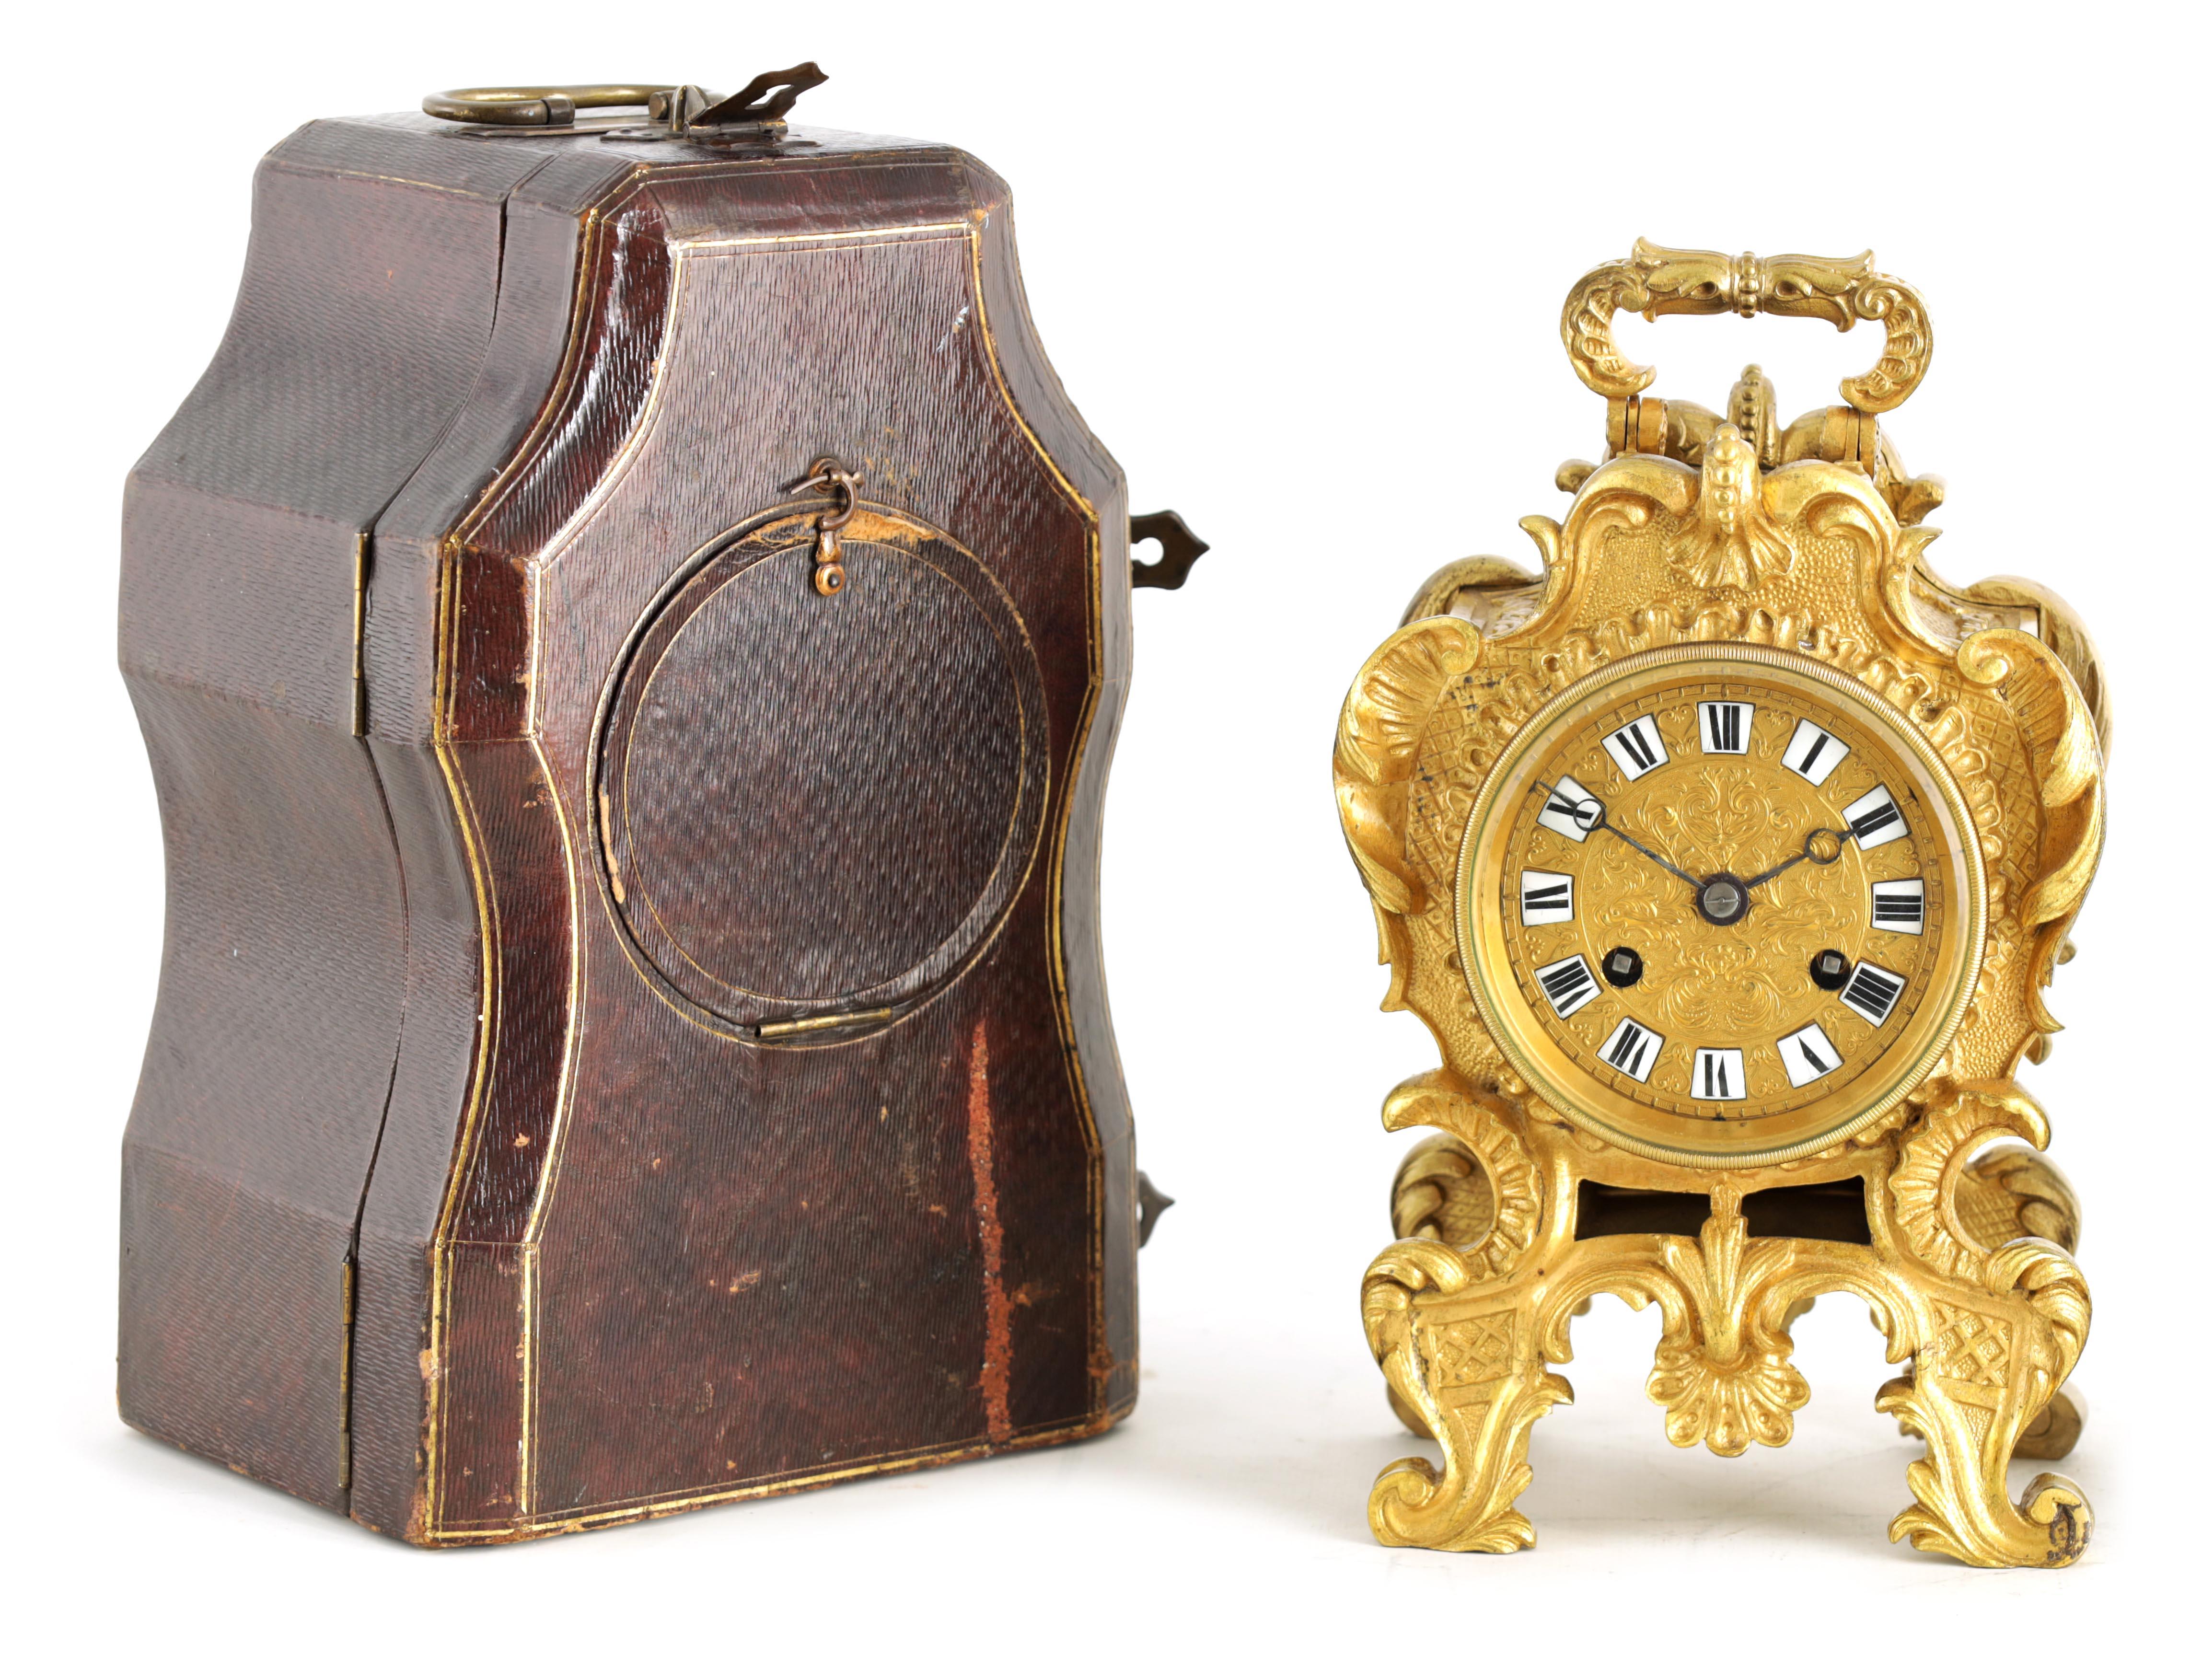 PAUL GARNIER, PARIS A MID 19TH CENTURY FRENCH TRAVELLING MANTEL CLOCK the gilt bronze rococo style